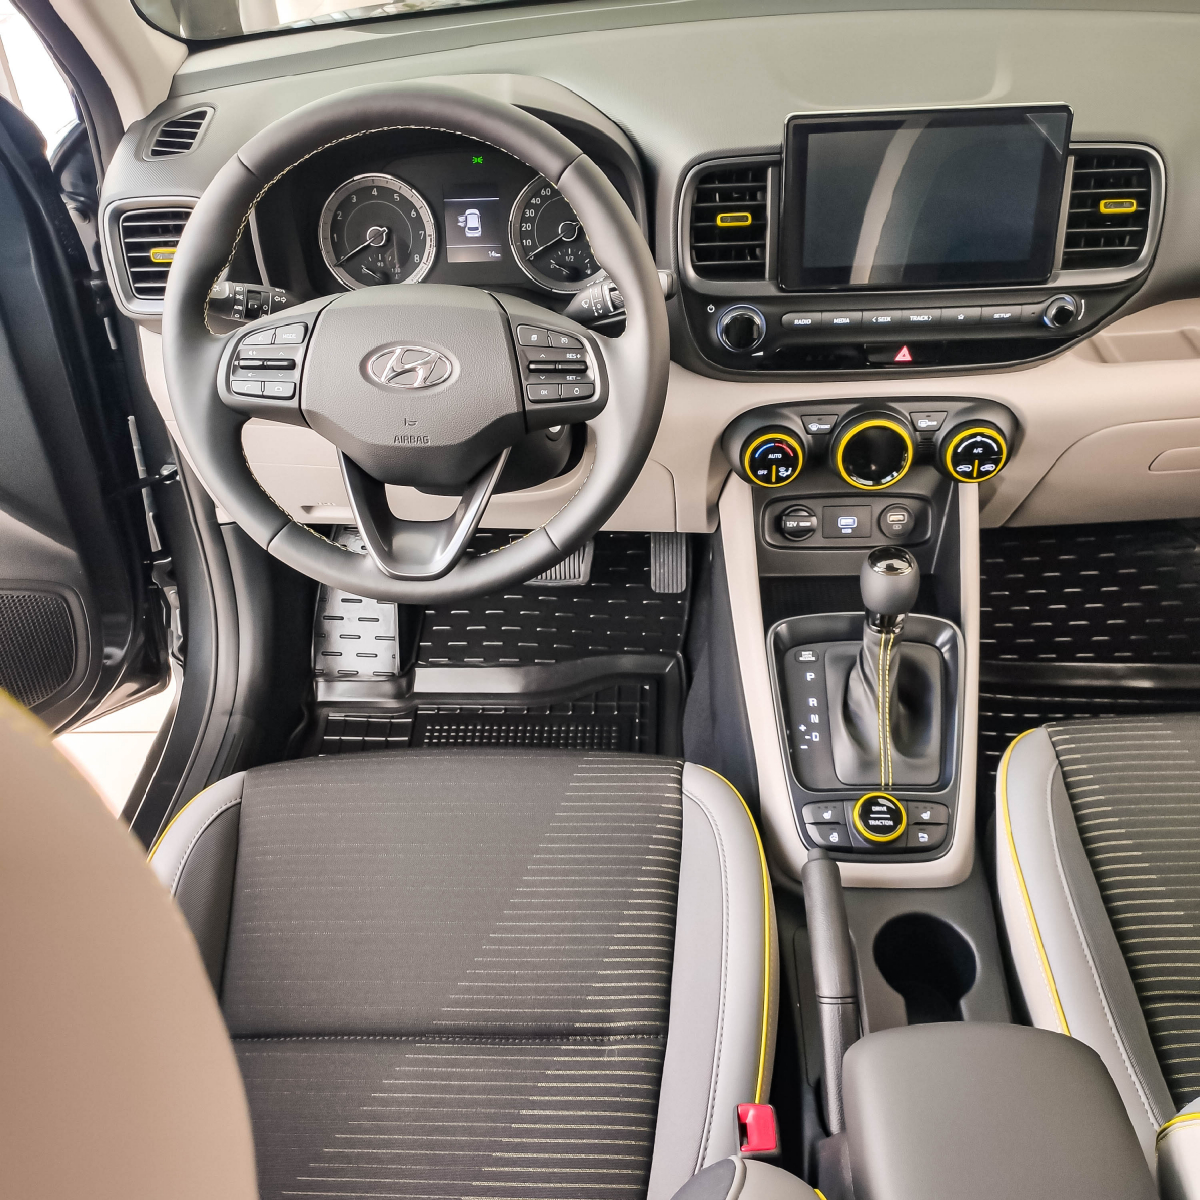 Абсолютно новий компактний міський кросовер Hyundai Venue   Хюндай Мотор Україна - фото 13